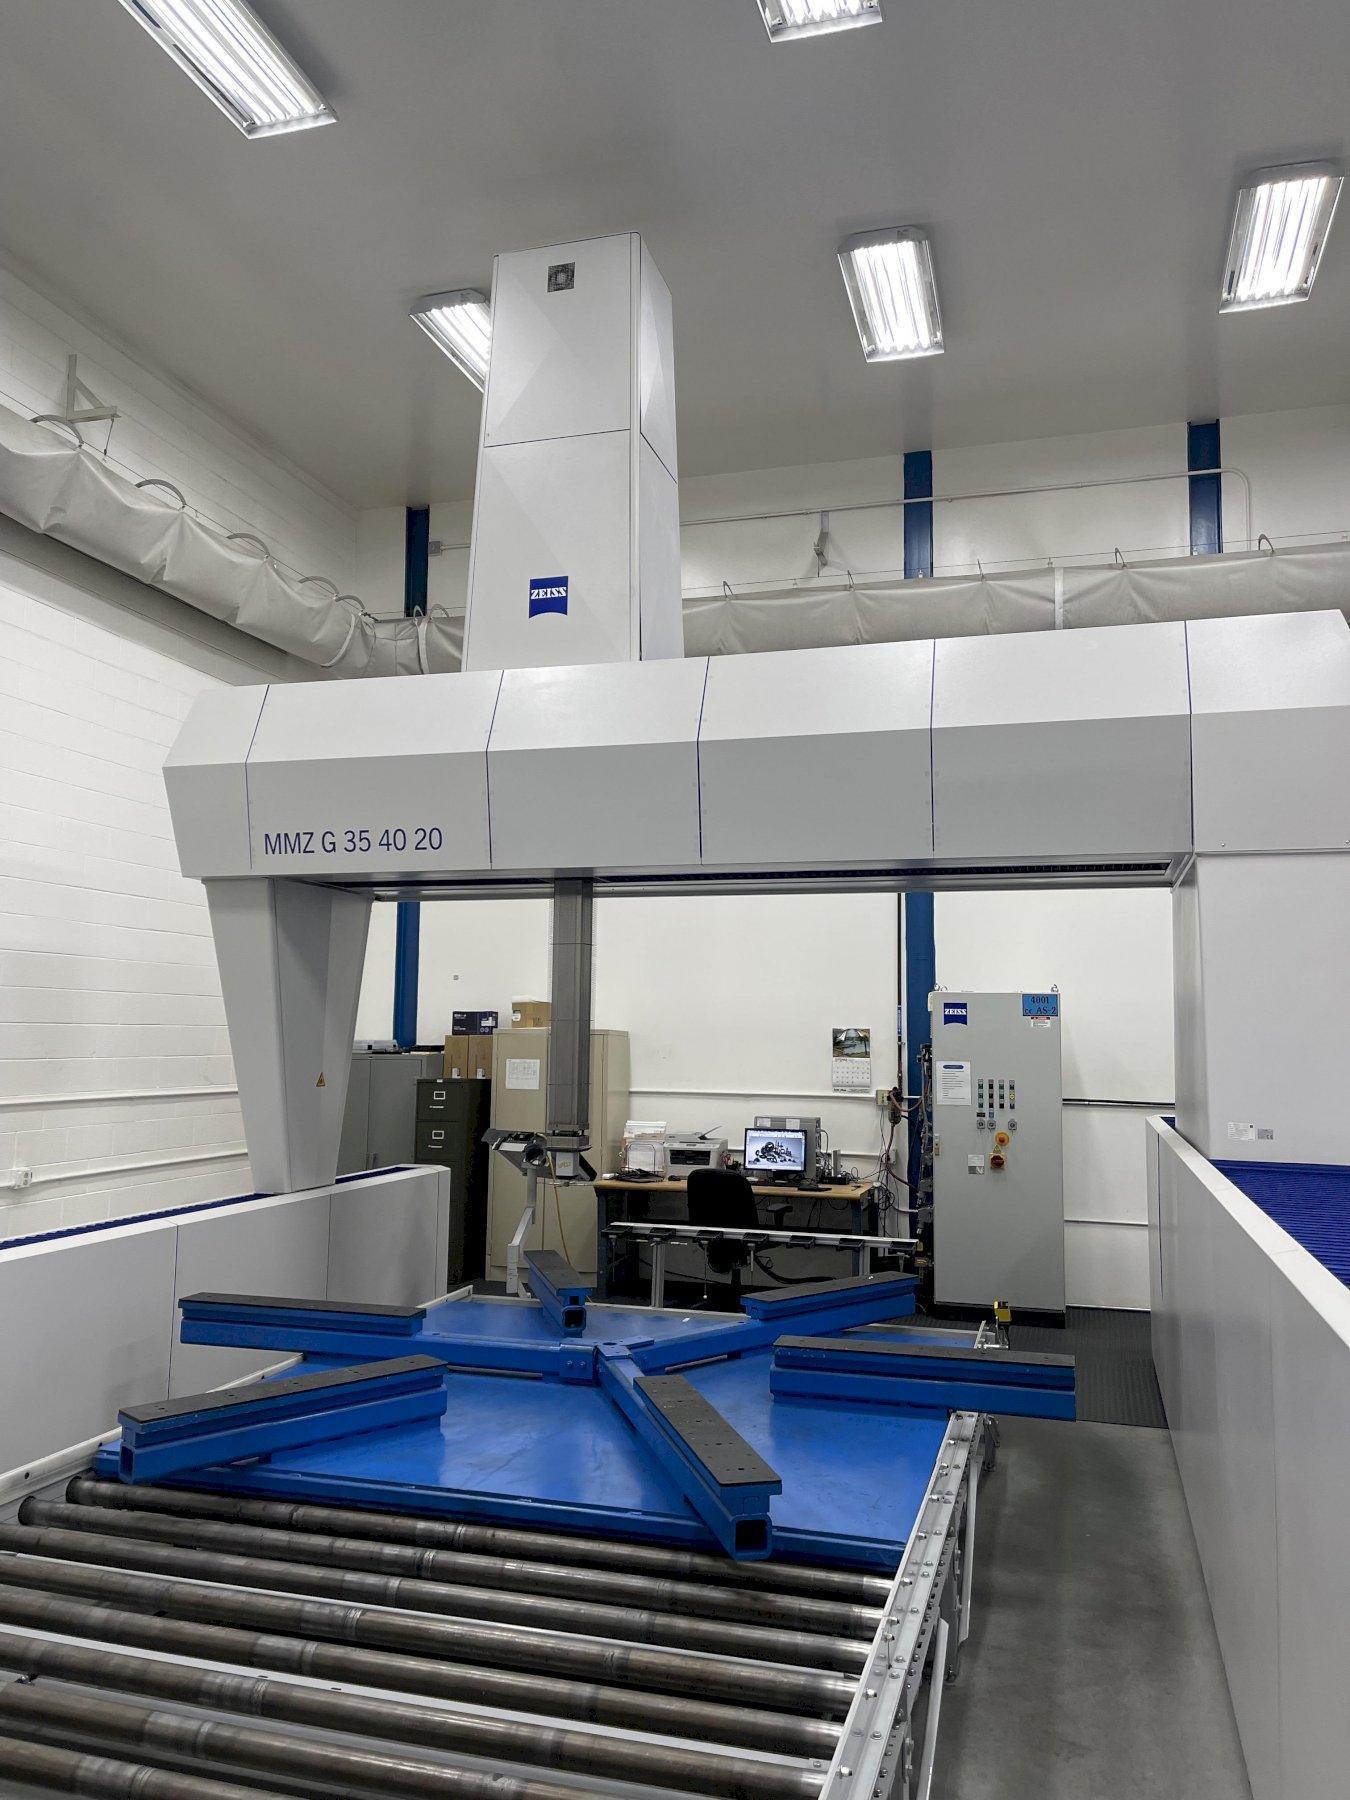 Zeiss MMZ-G 35/40/20 Coordinate Measuring Machine (CMM) (#33278)